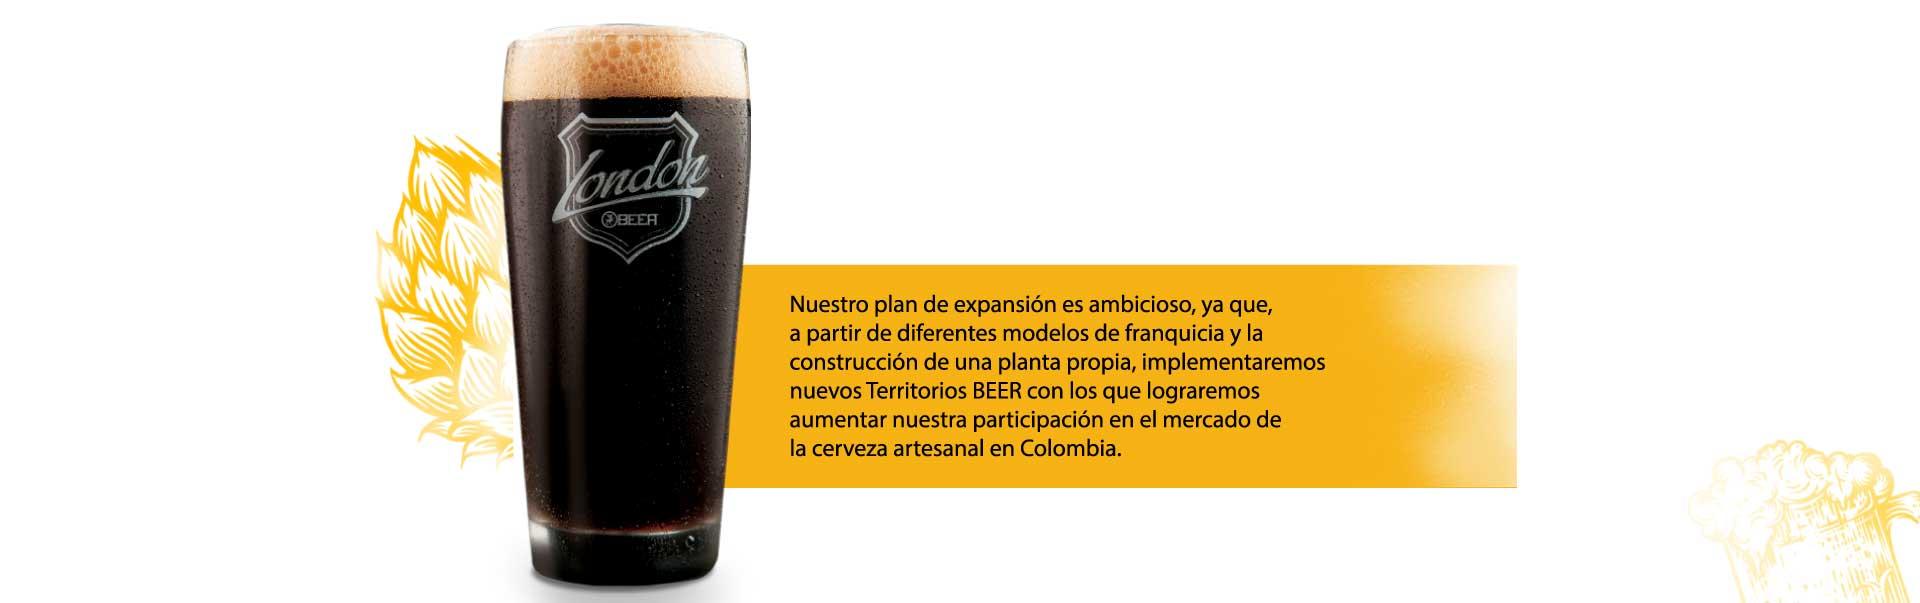 franquicias beer, franquicias bogota, franquicias comprar, franquicias colombia, franquicias de cervezas, pub de cerveza artesanal